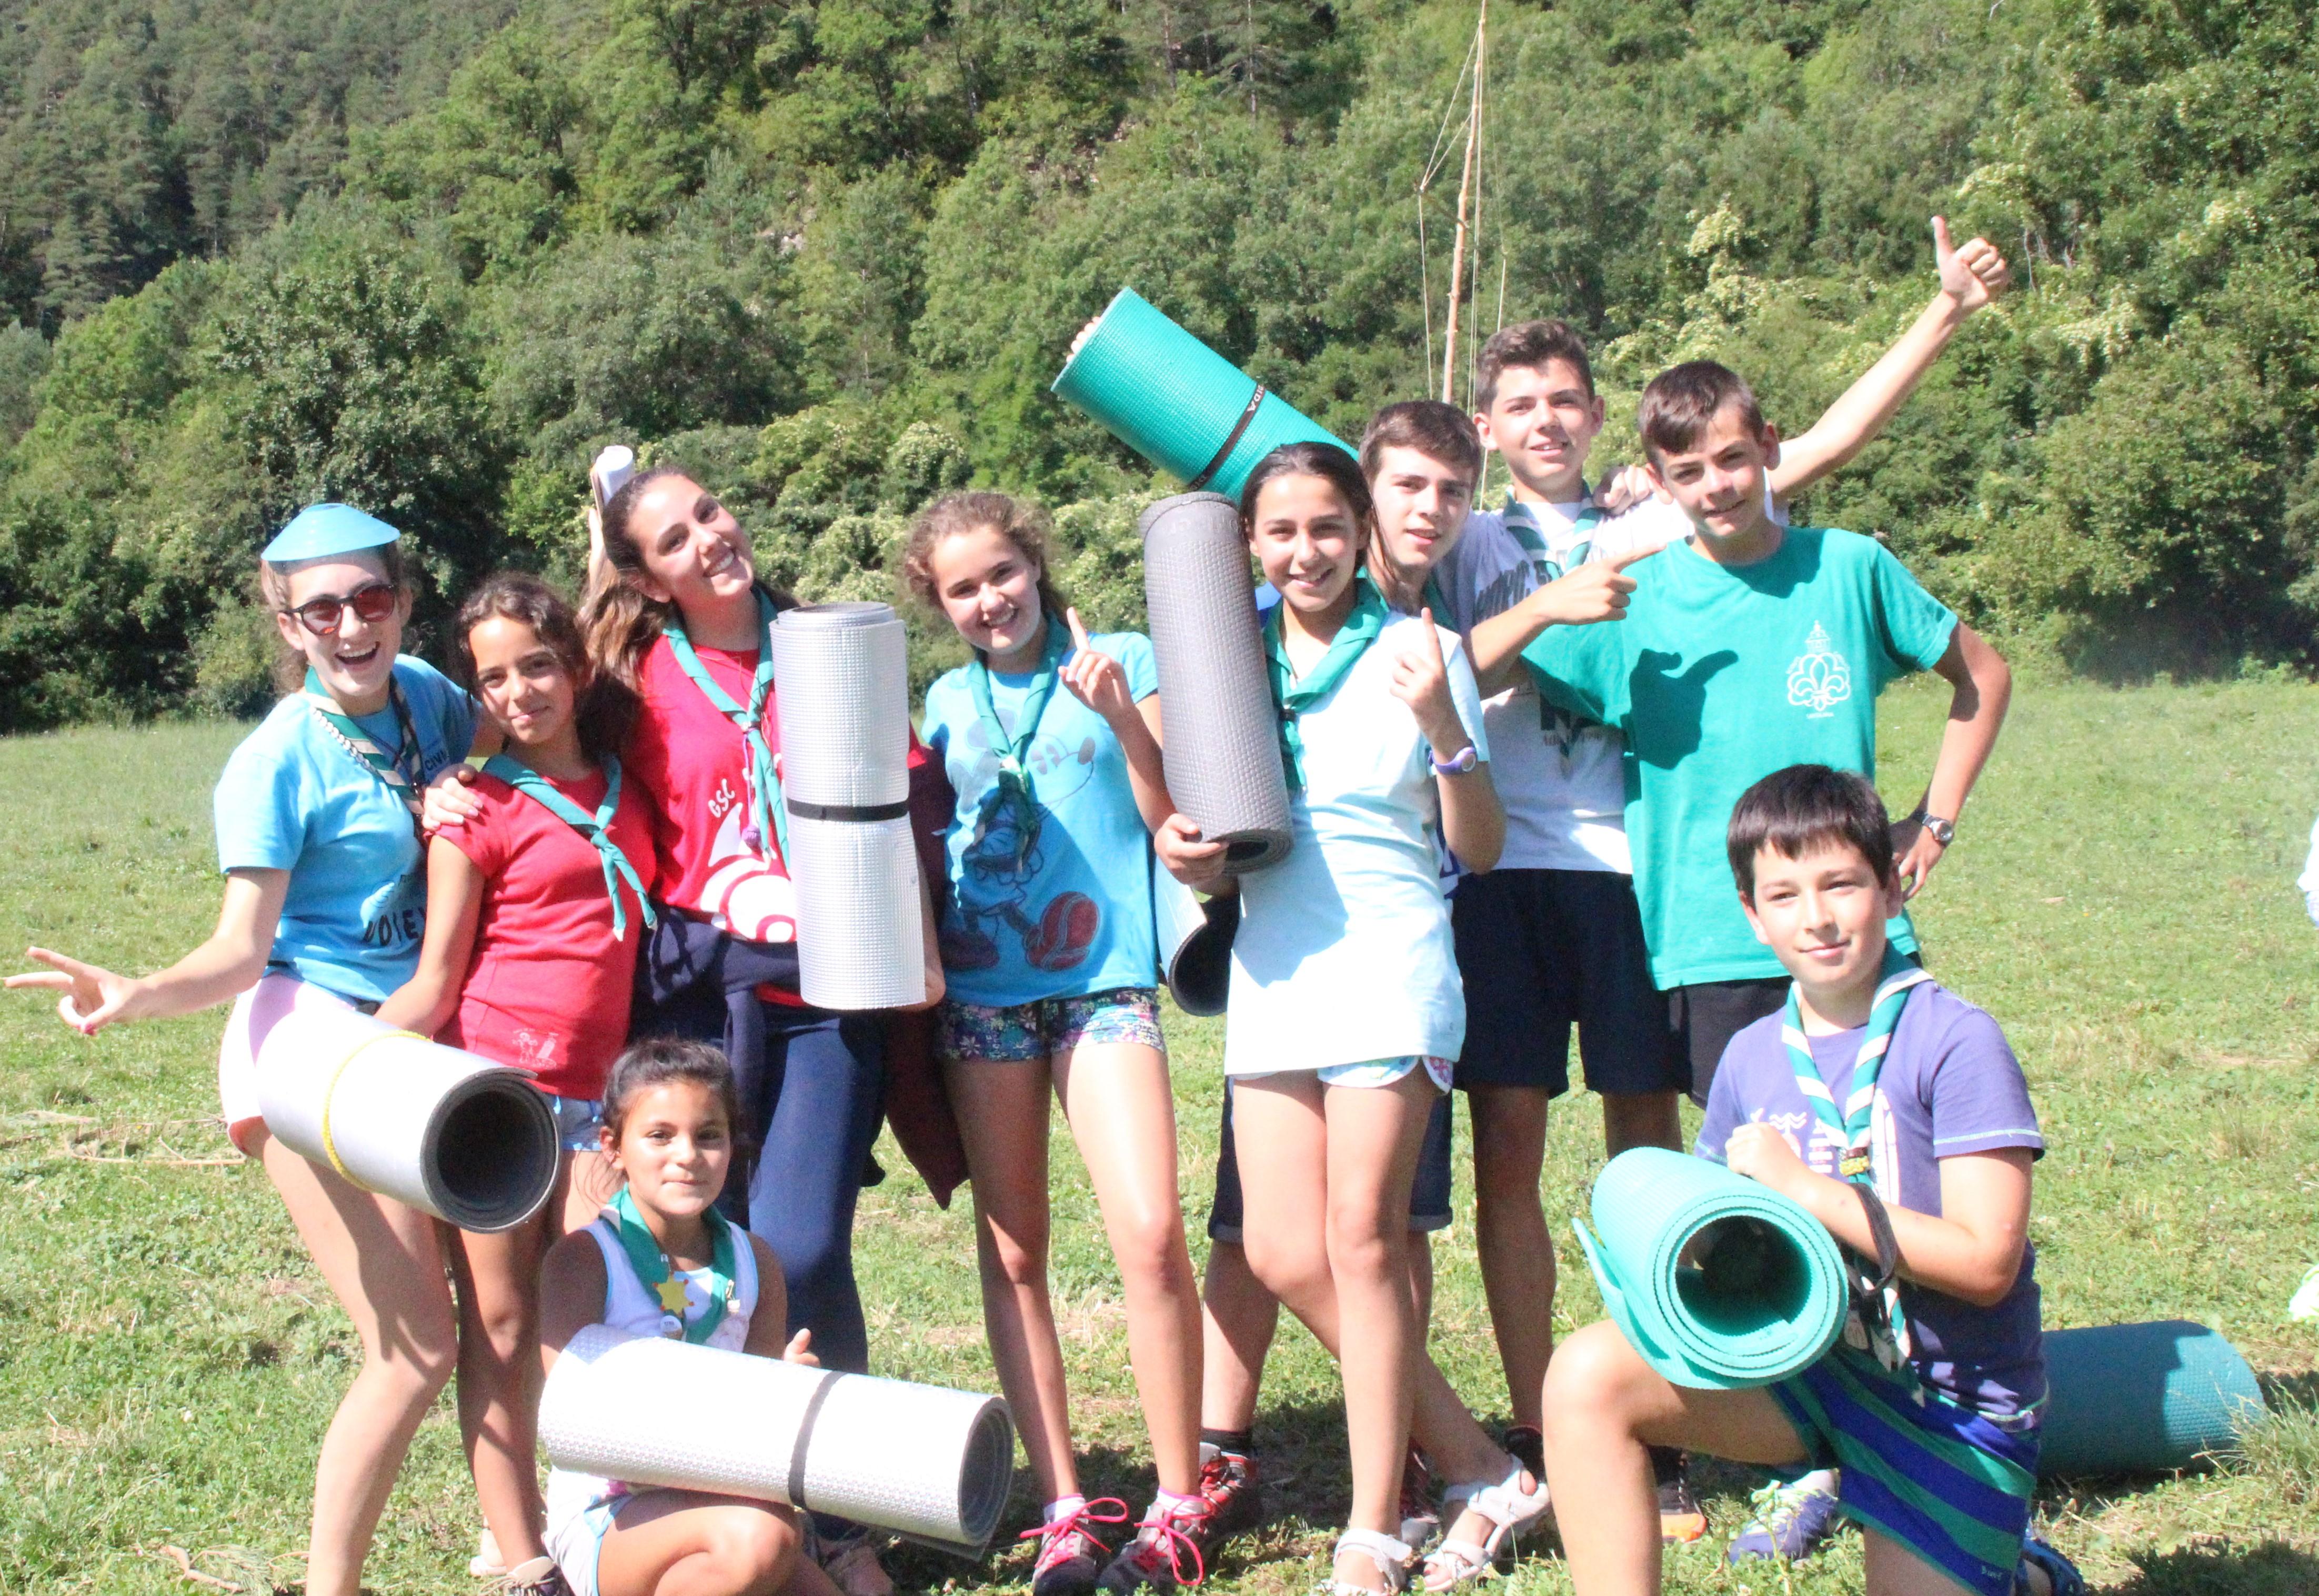 15-16 - Grupo - Campamento de verano - P102